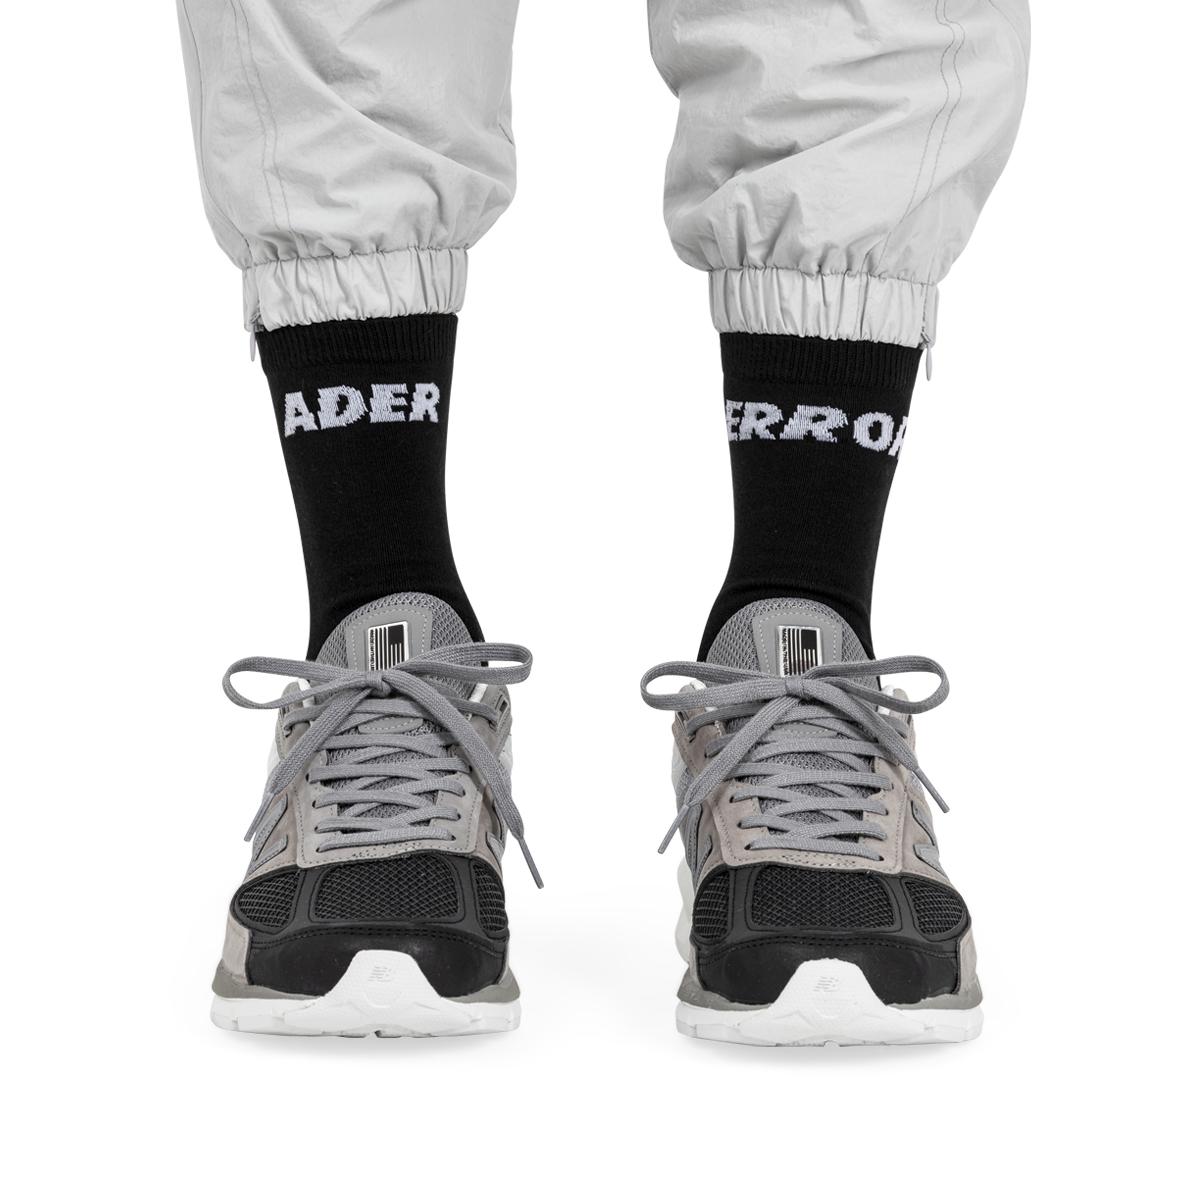 ADER Error Nase Socks